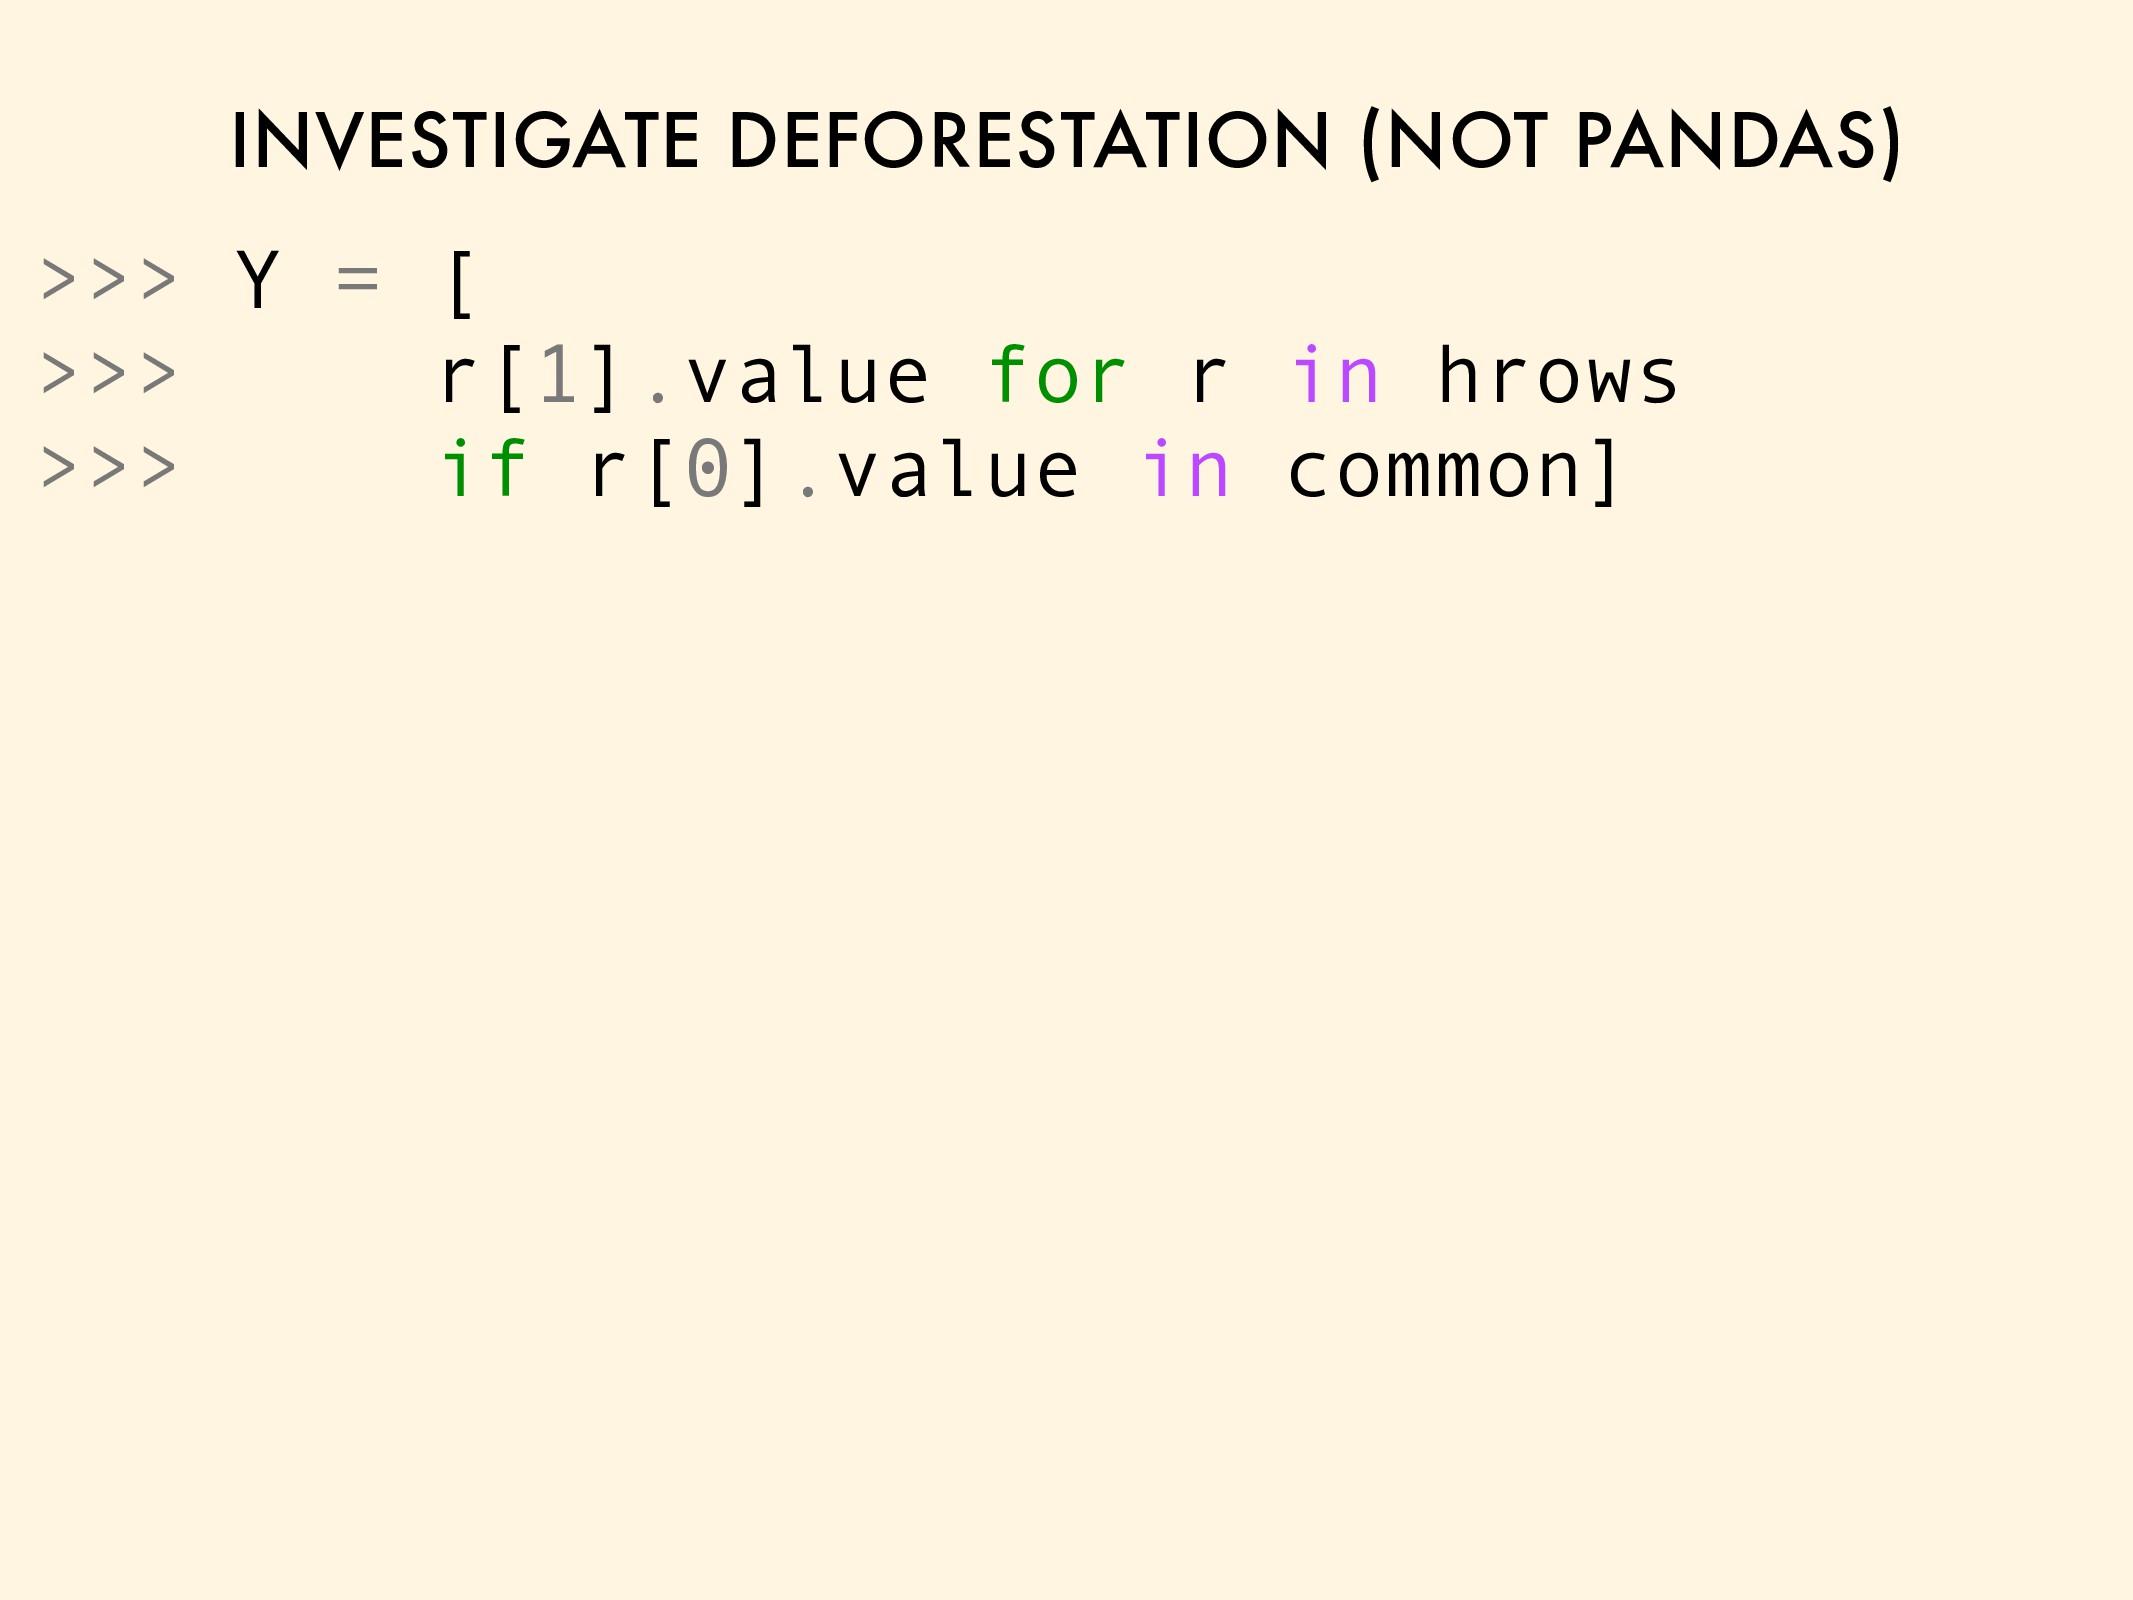 INVESTIGATE DEFORESTATION (NOT PANDAS) >>> Y = ...